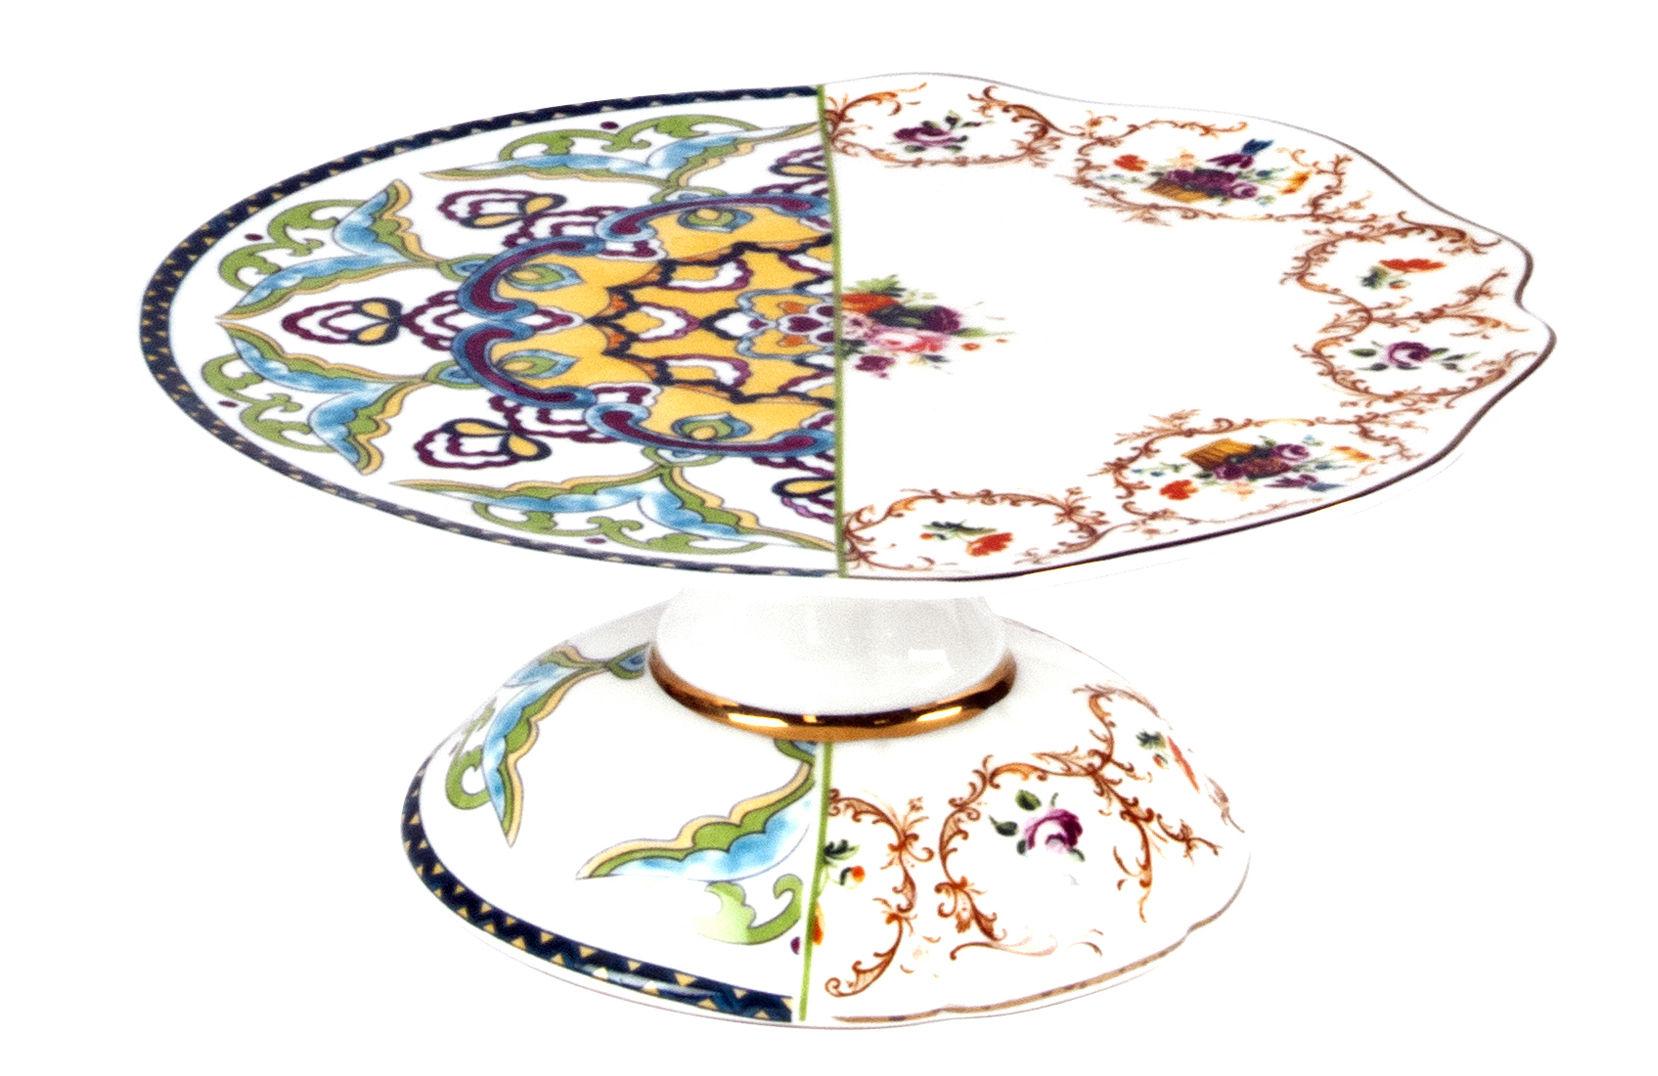 Tableware - Serving Plates - Hybrid Léandra Baking tray by Seletti - Multicolor - Bone china